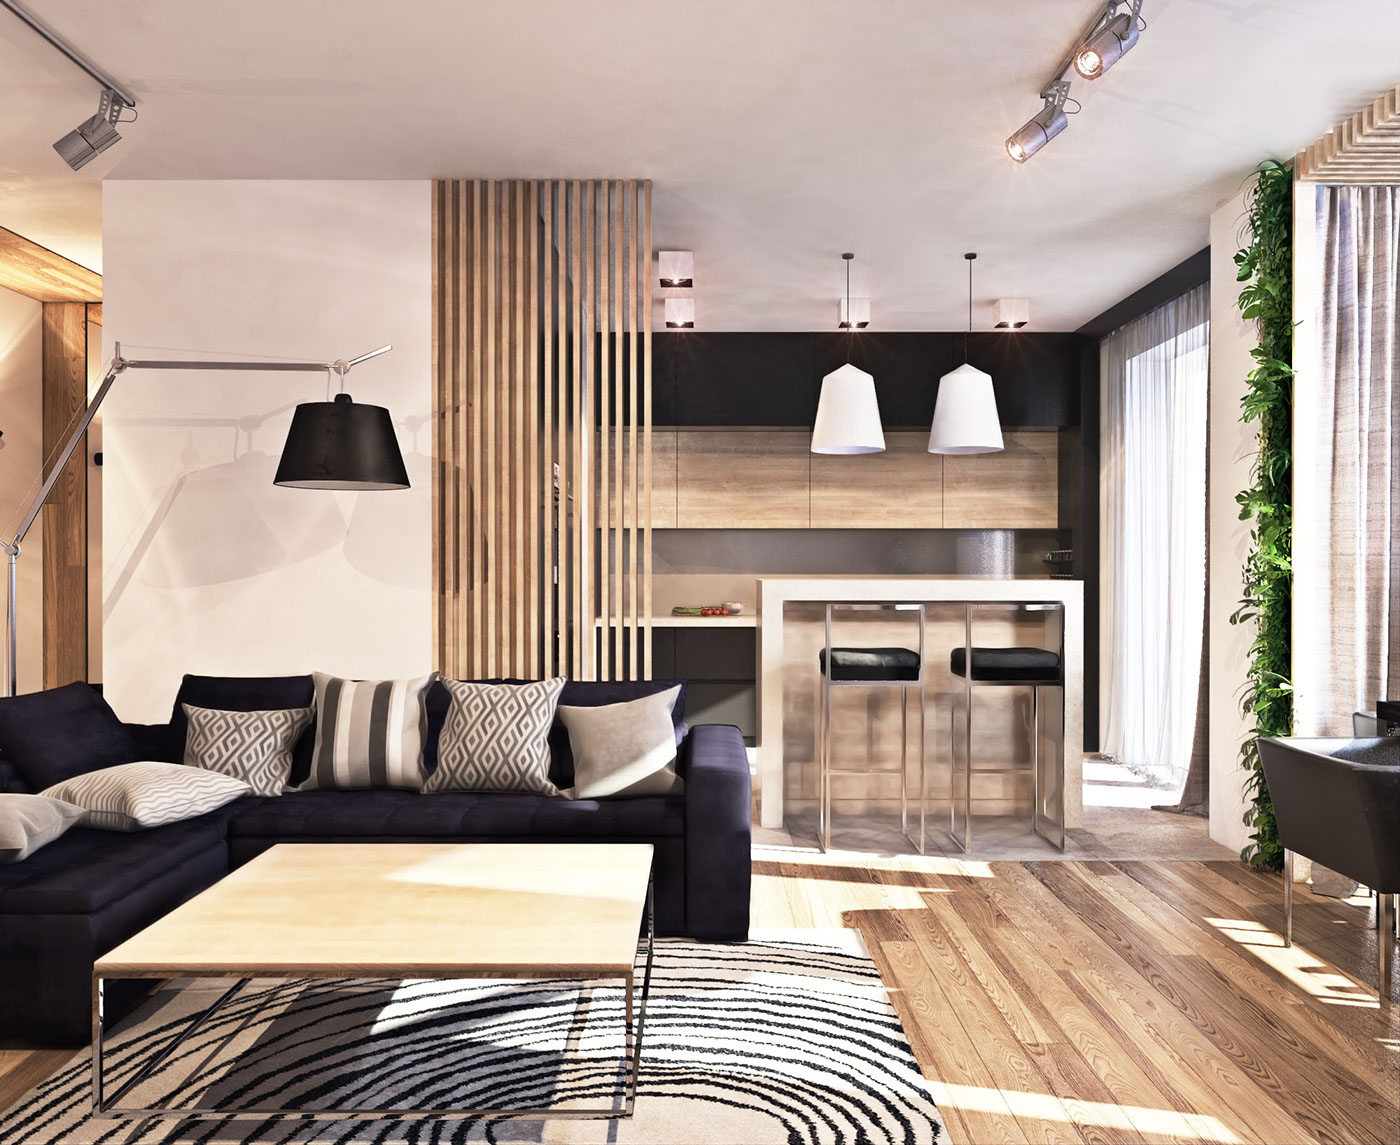 living room designs 2016 uk brown leather furniture decor modern interior design ideas